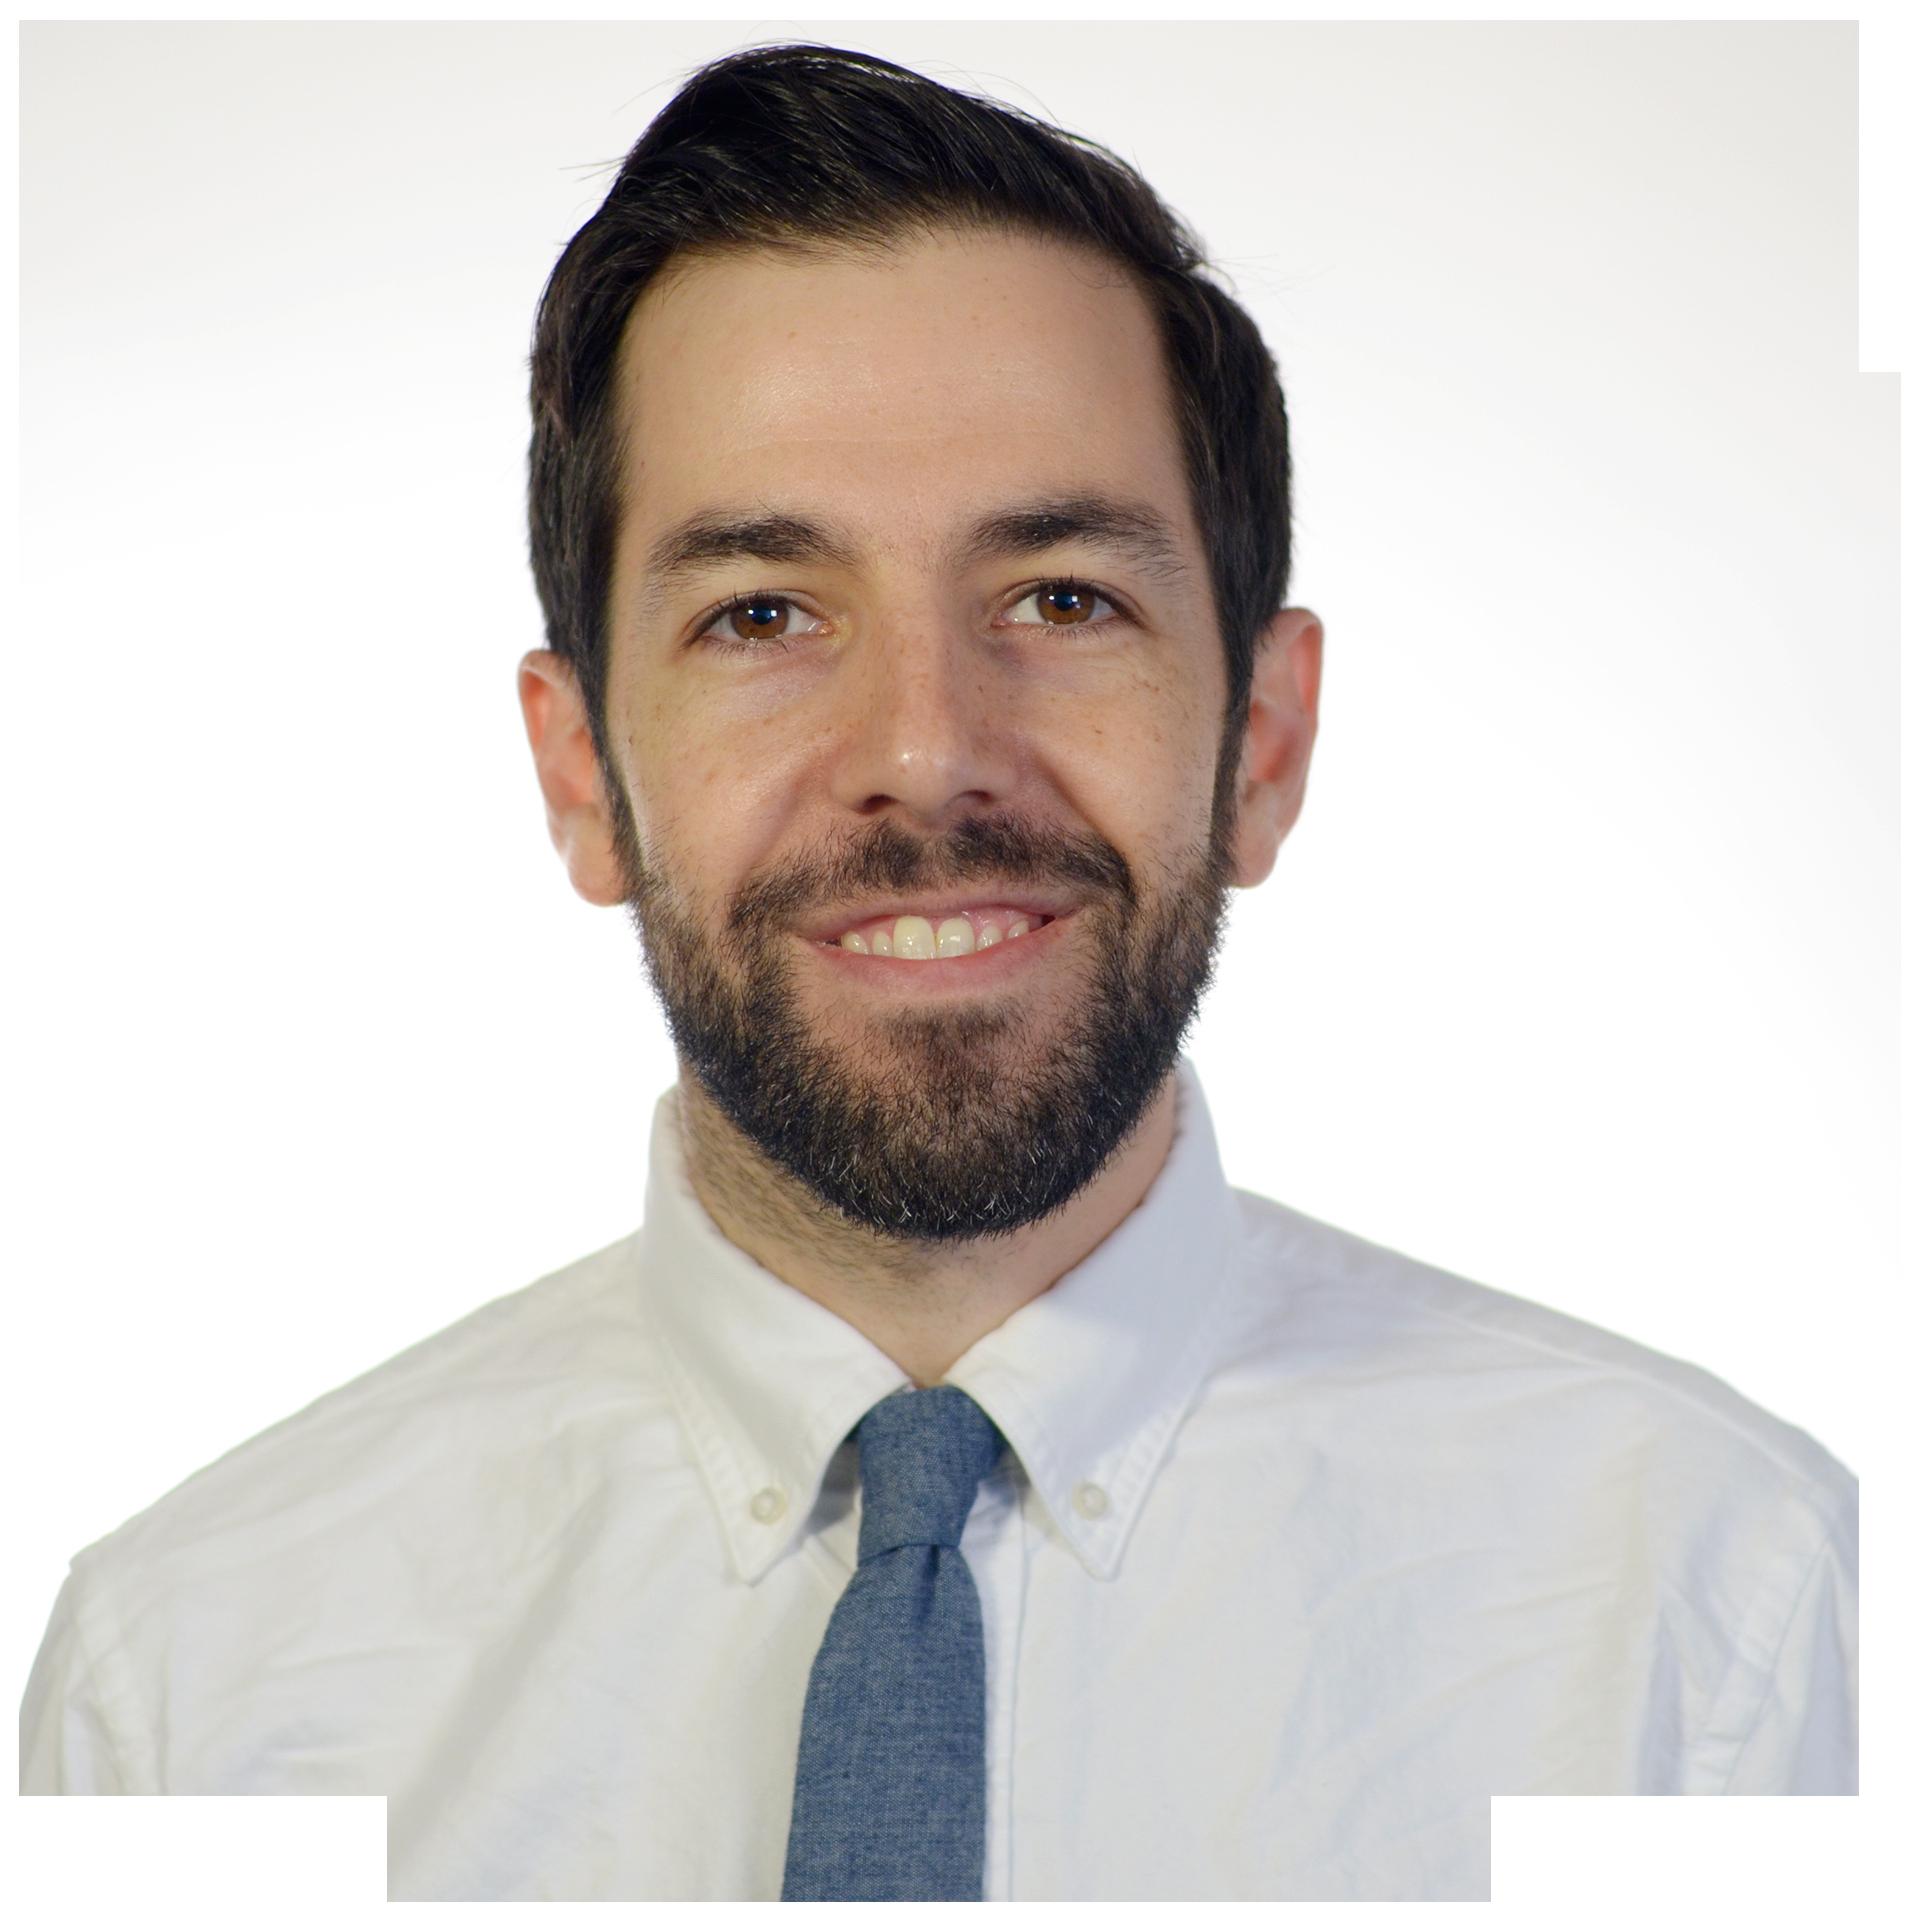 Sam Seidel - IDC Advisor; Director of the K-12 Lab at Stanford's d.school